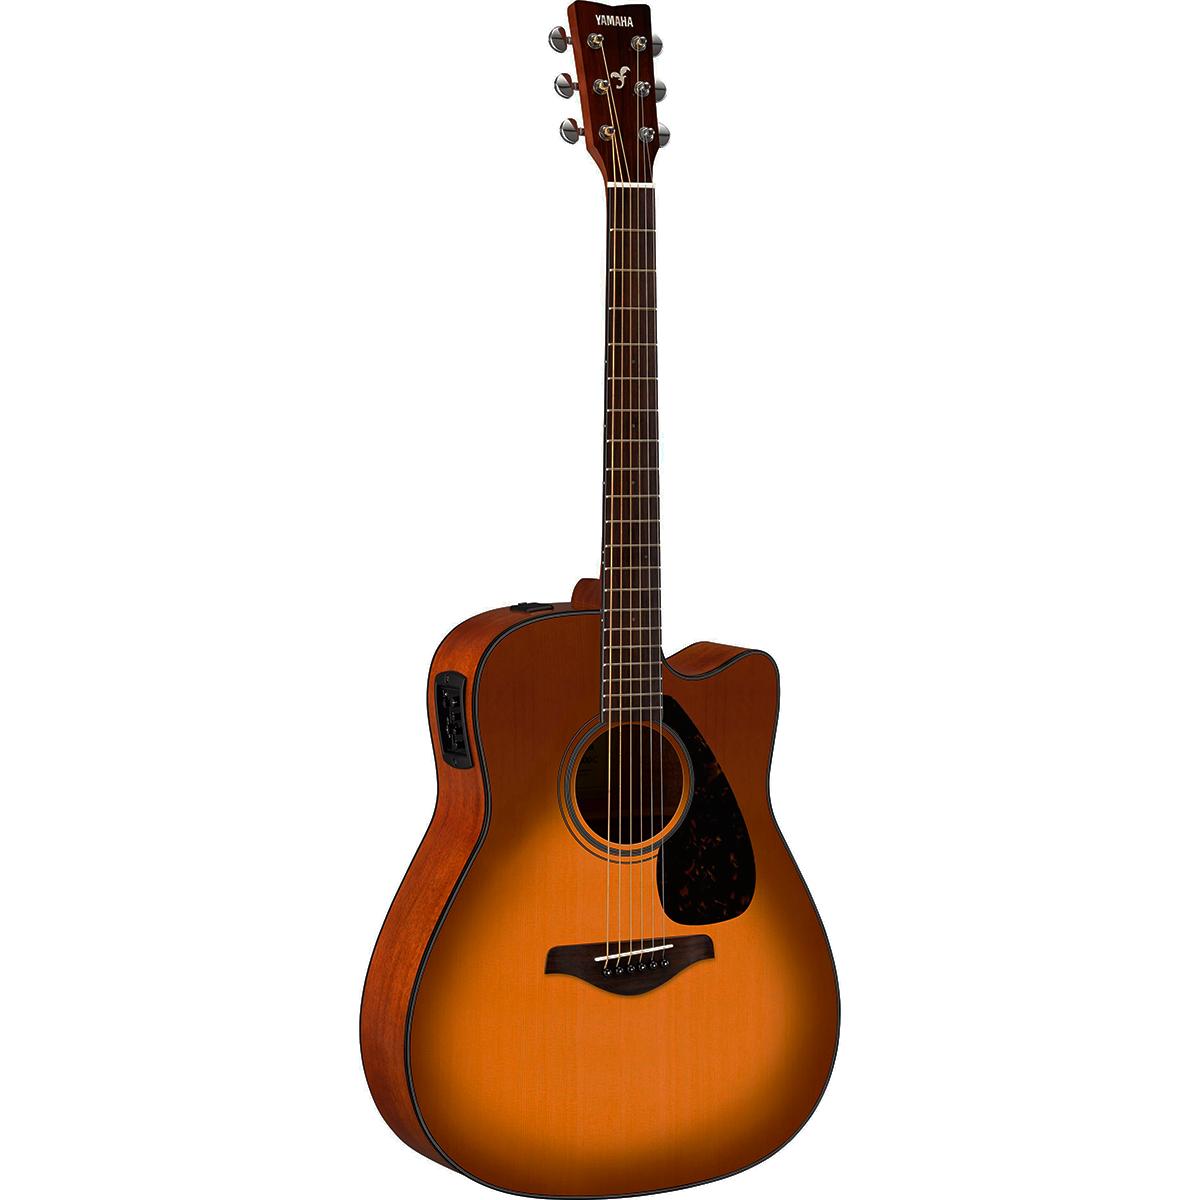 Yamaha FGX800CSDB western-guitar sandburst